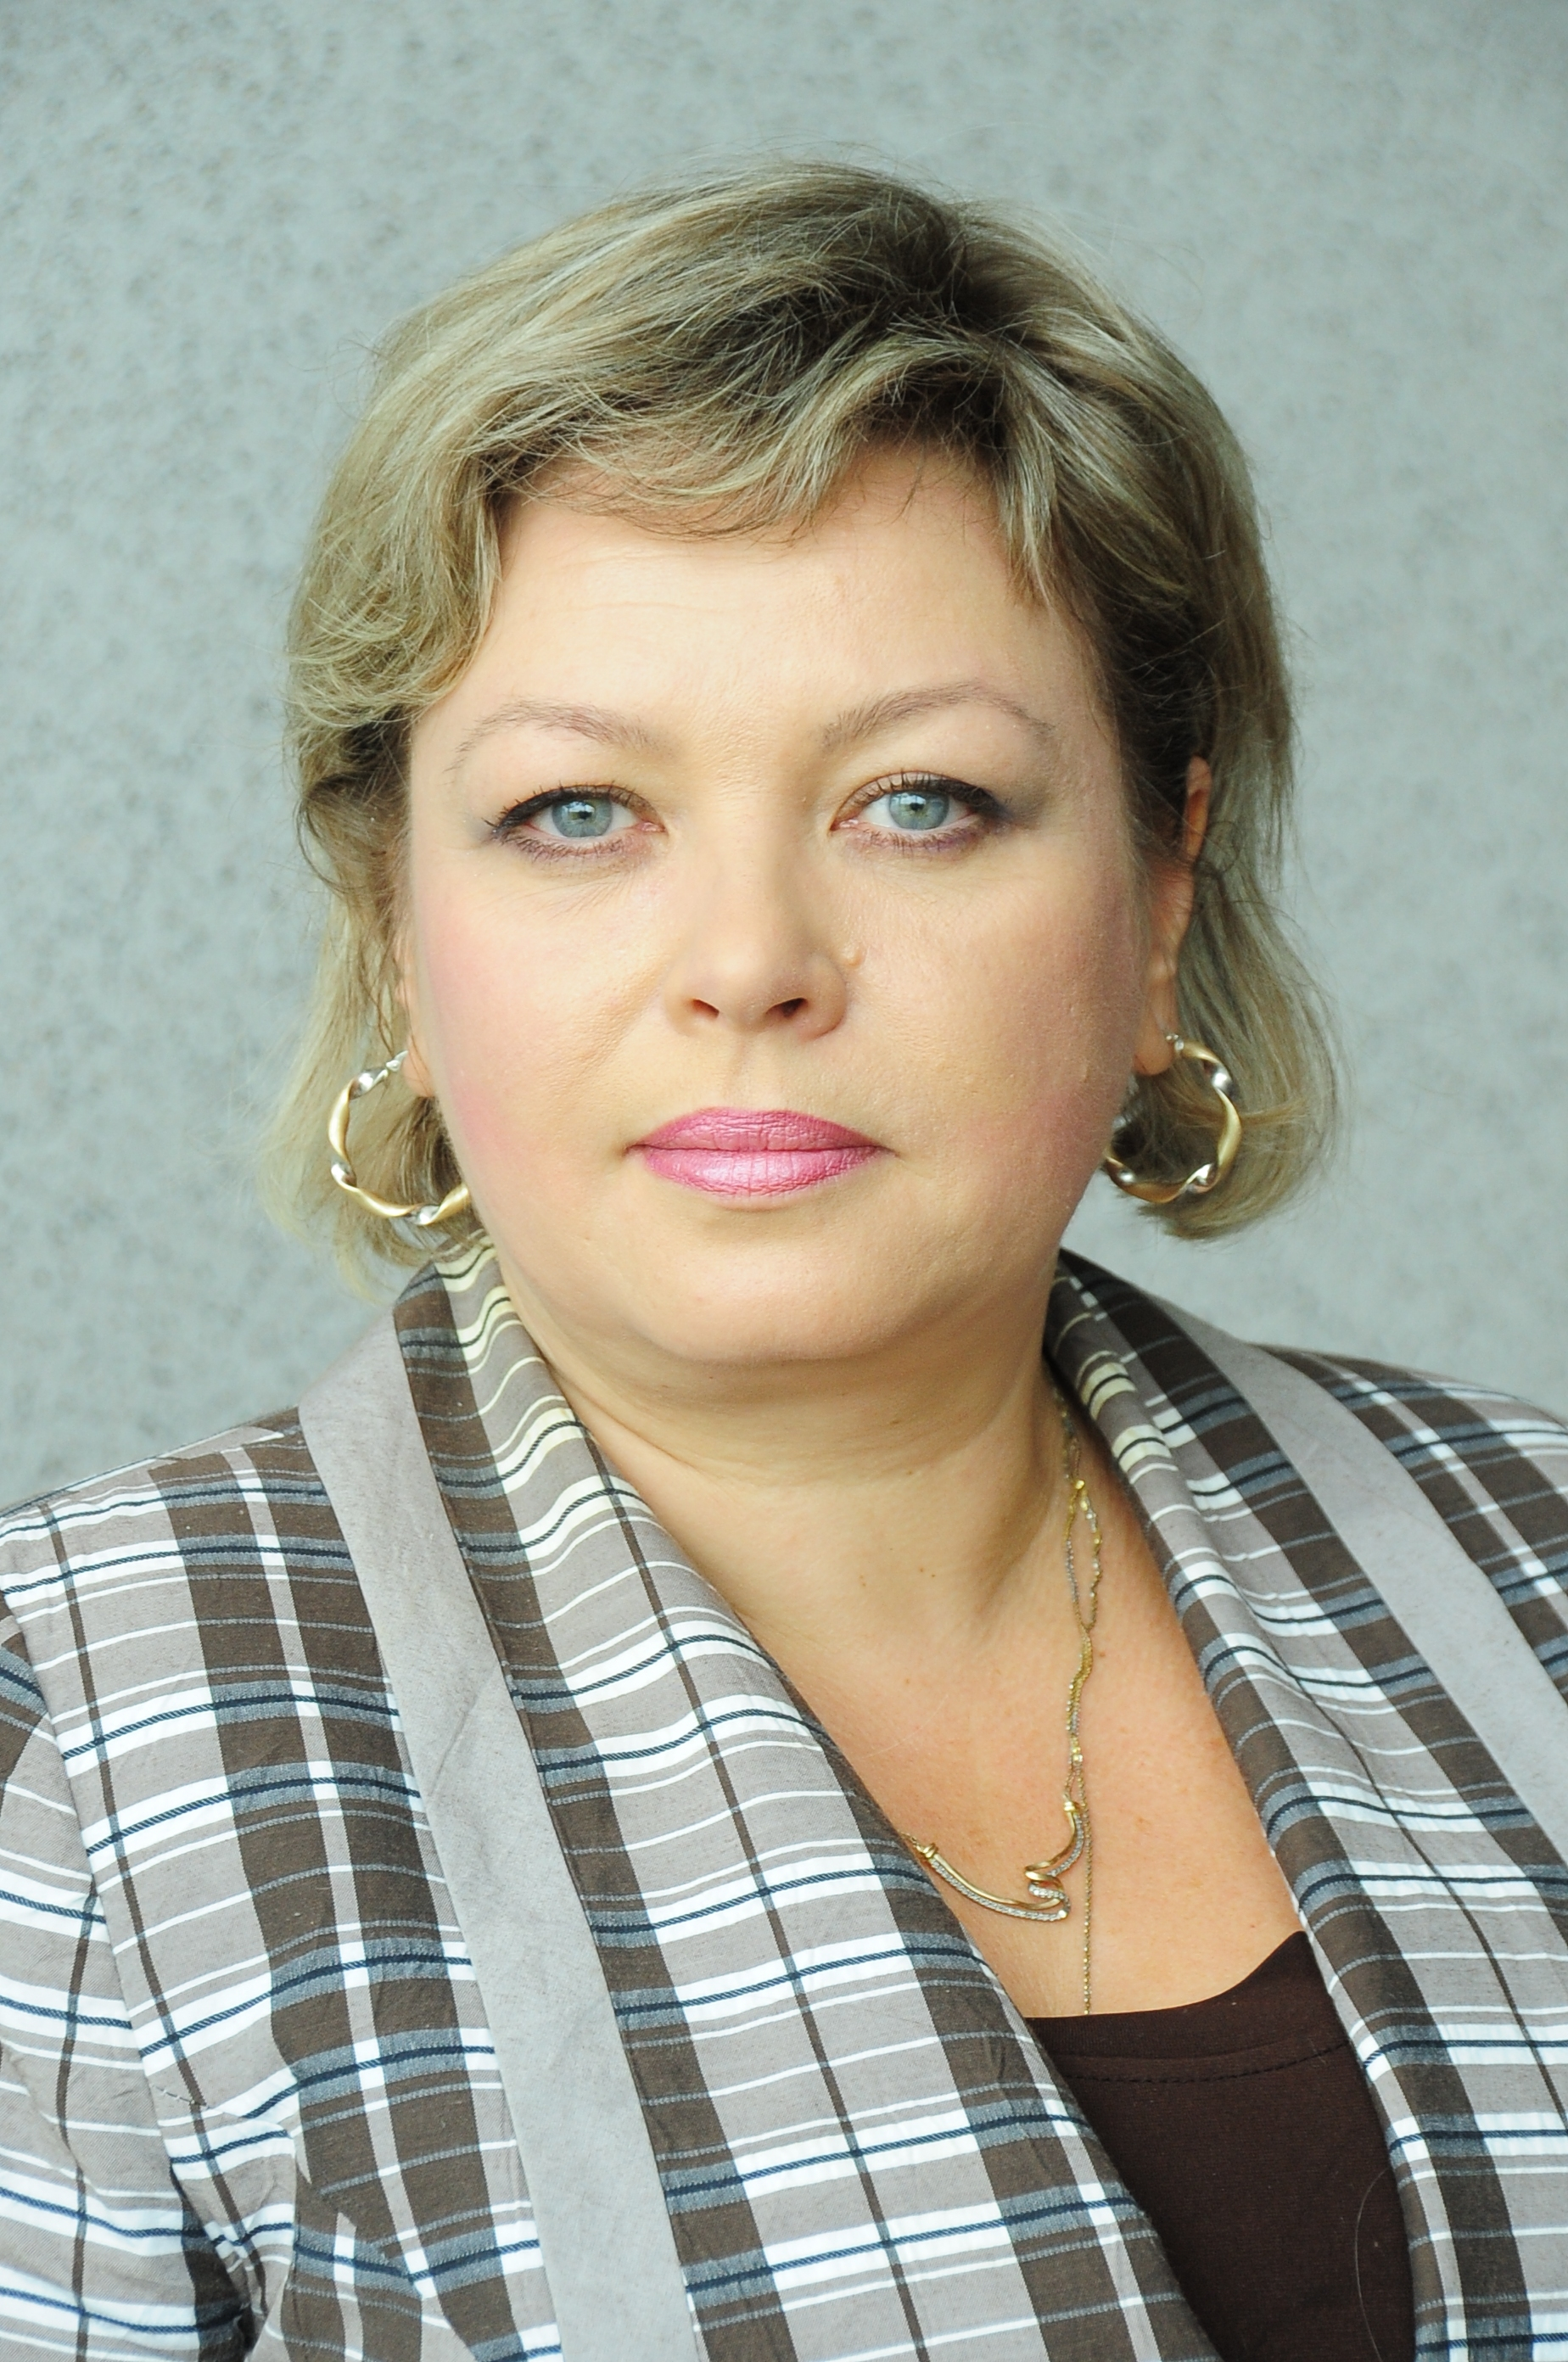 law essay help ukrainian